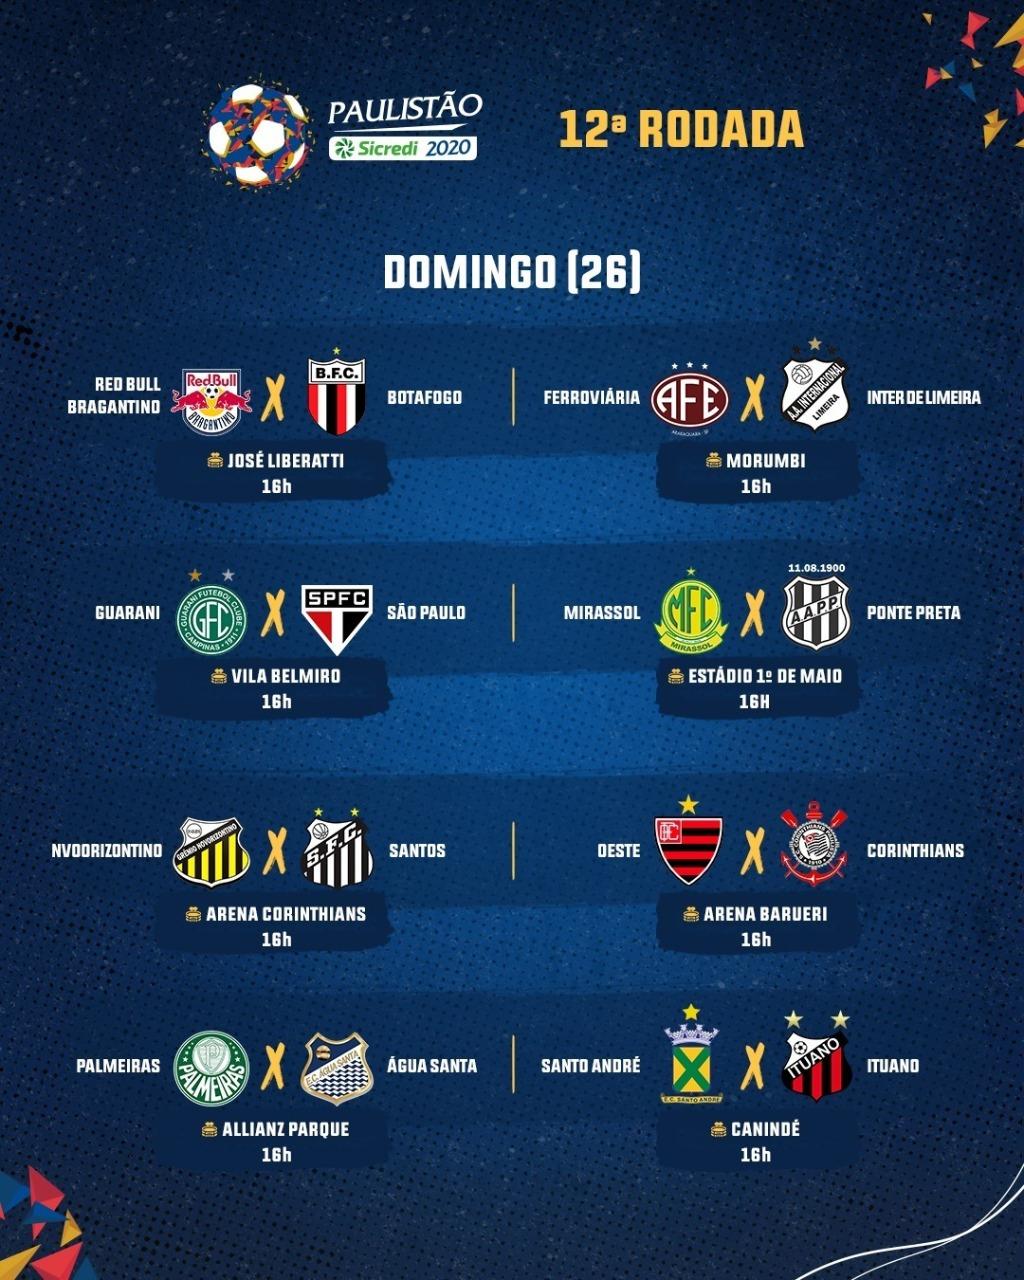 12ª rodada do Campeonato Paulista